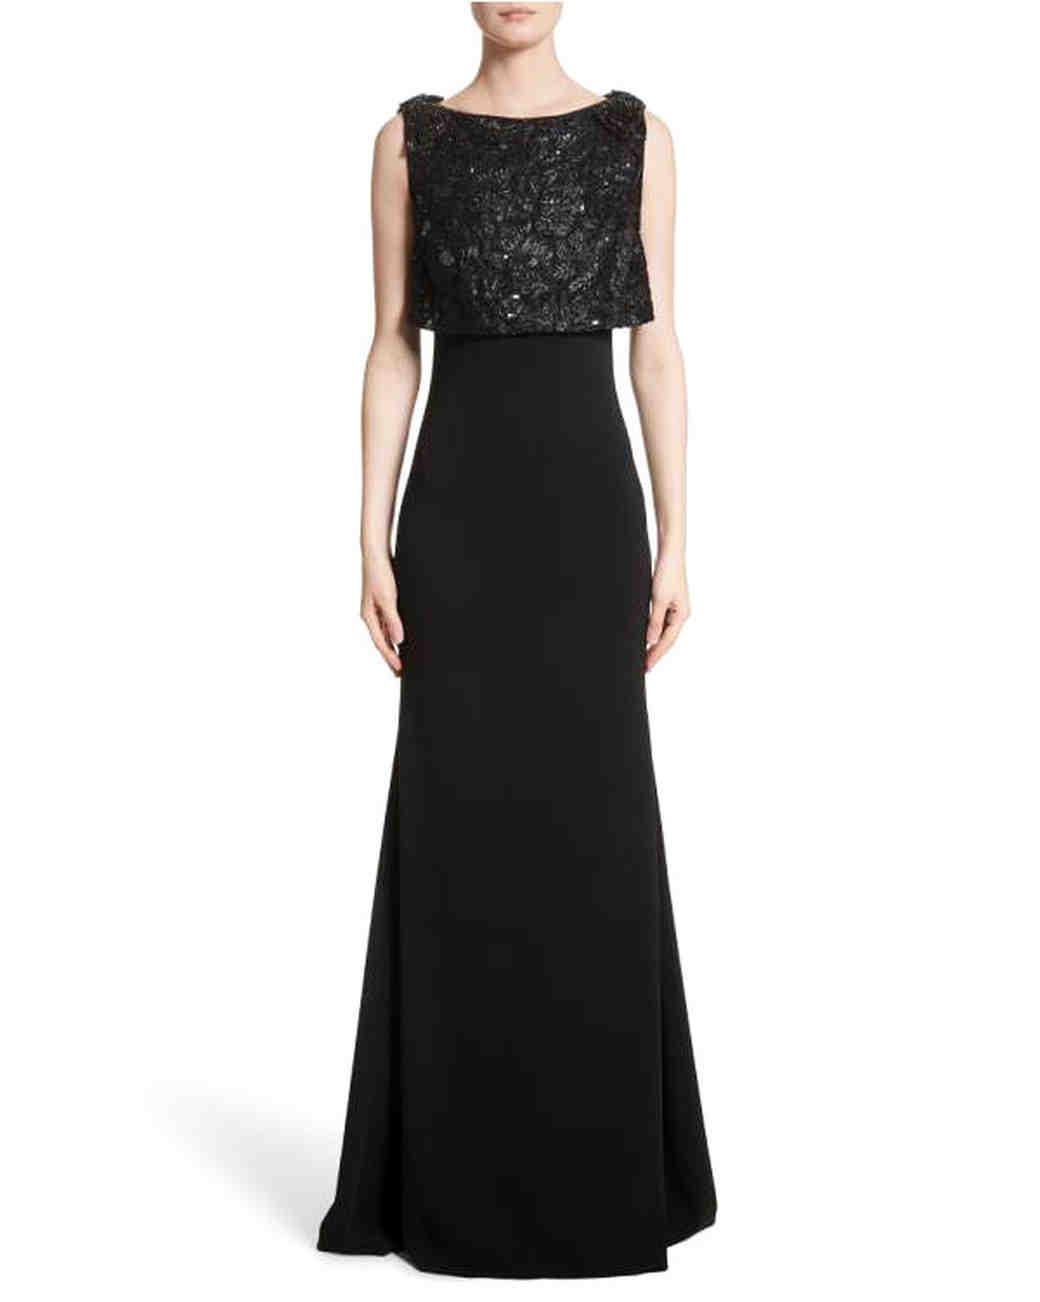 black mother of the bride dress